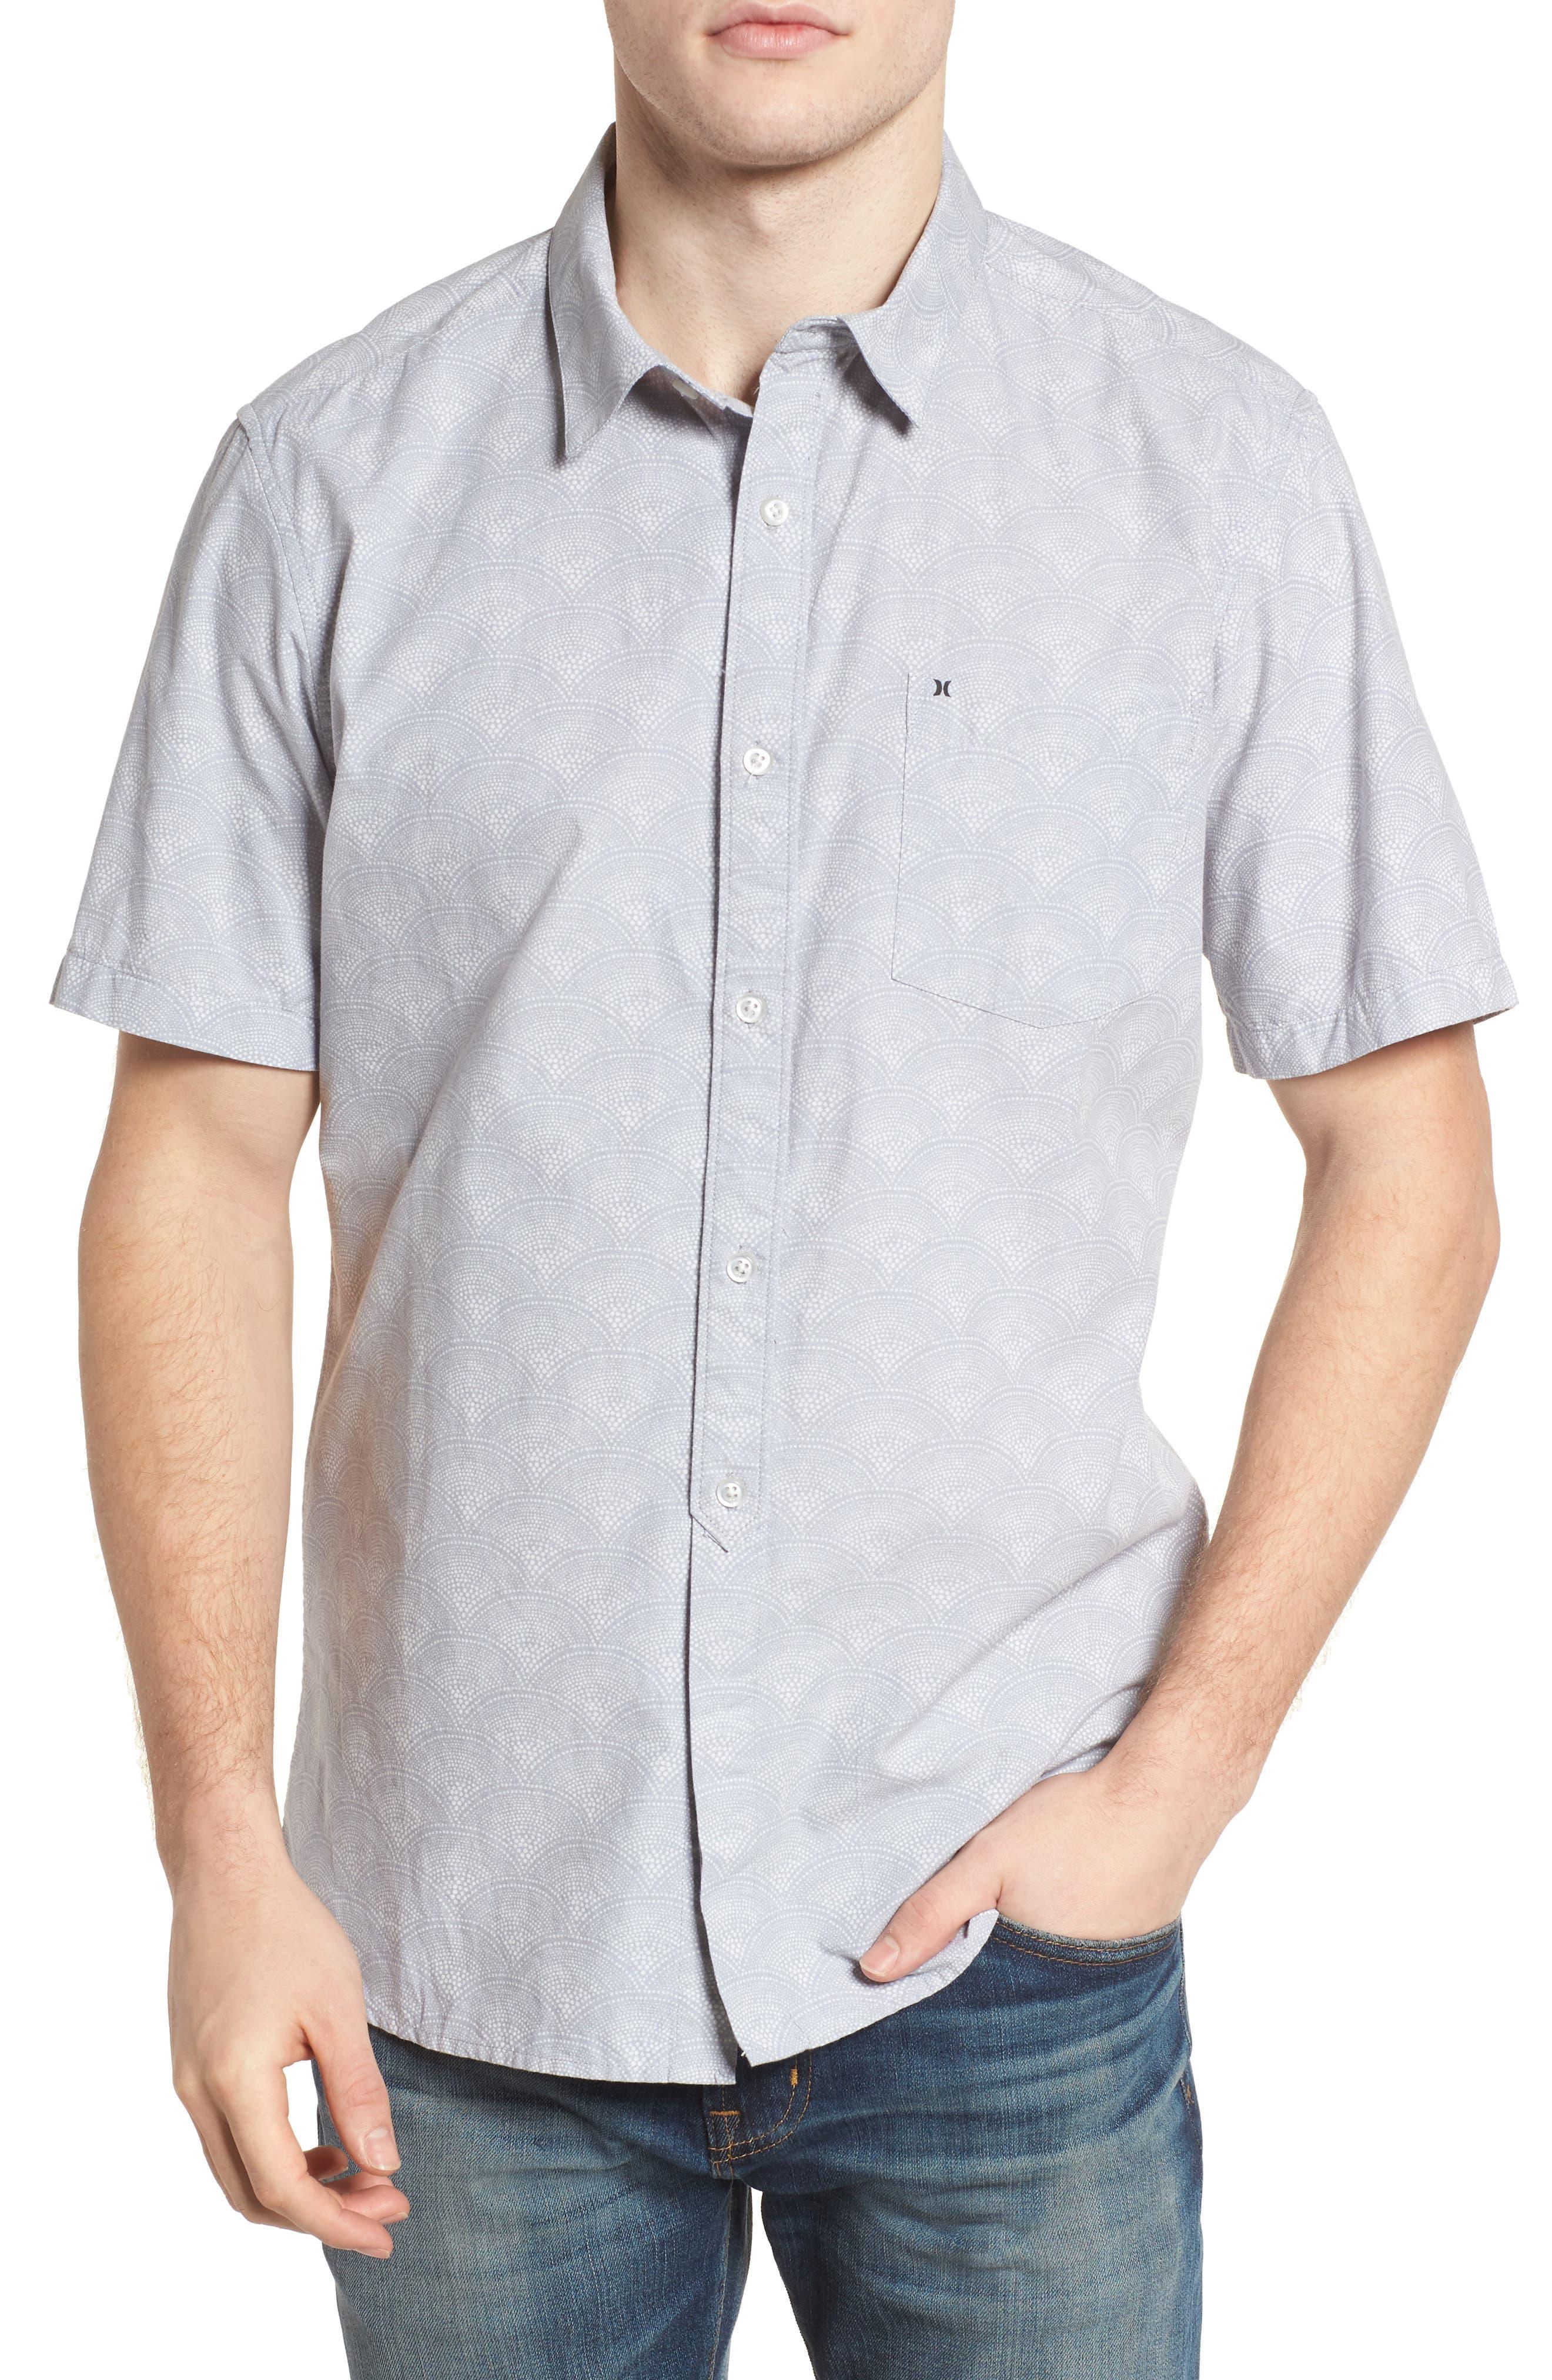 Pescado Short Sleeve Oxford Shirt,                         Main,                         color, LIGHT PUMICE